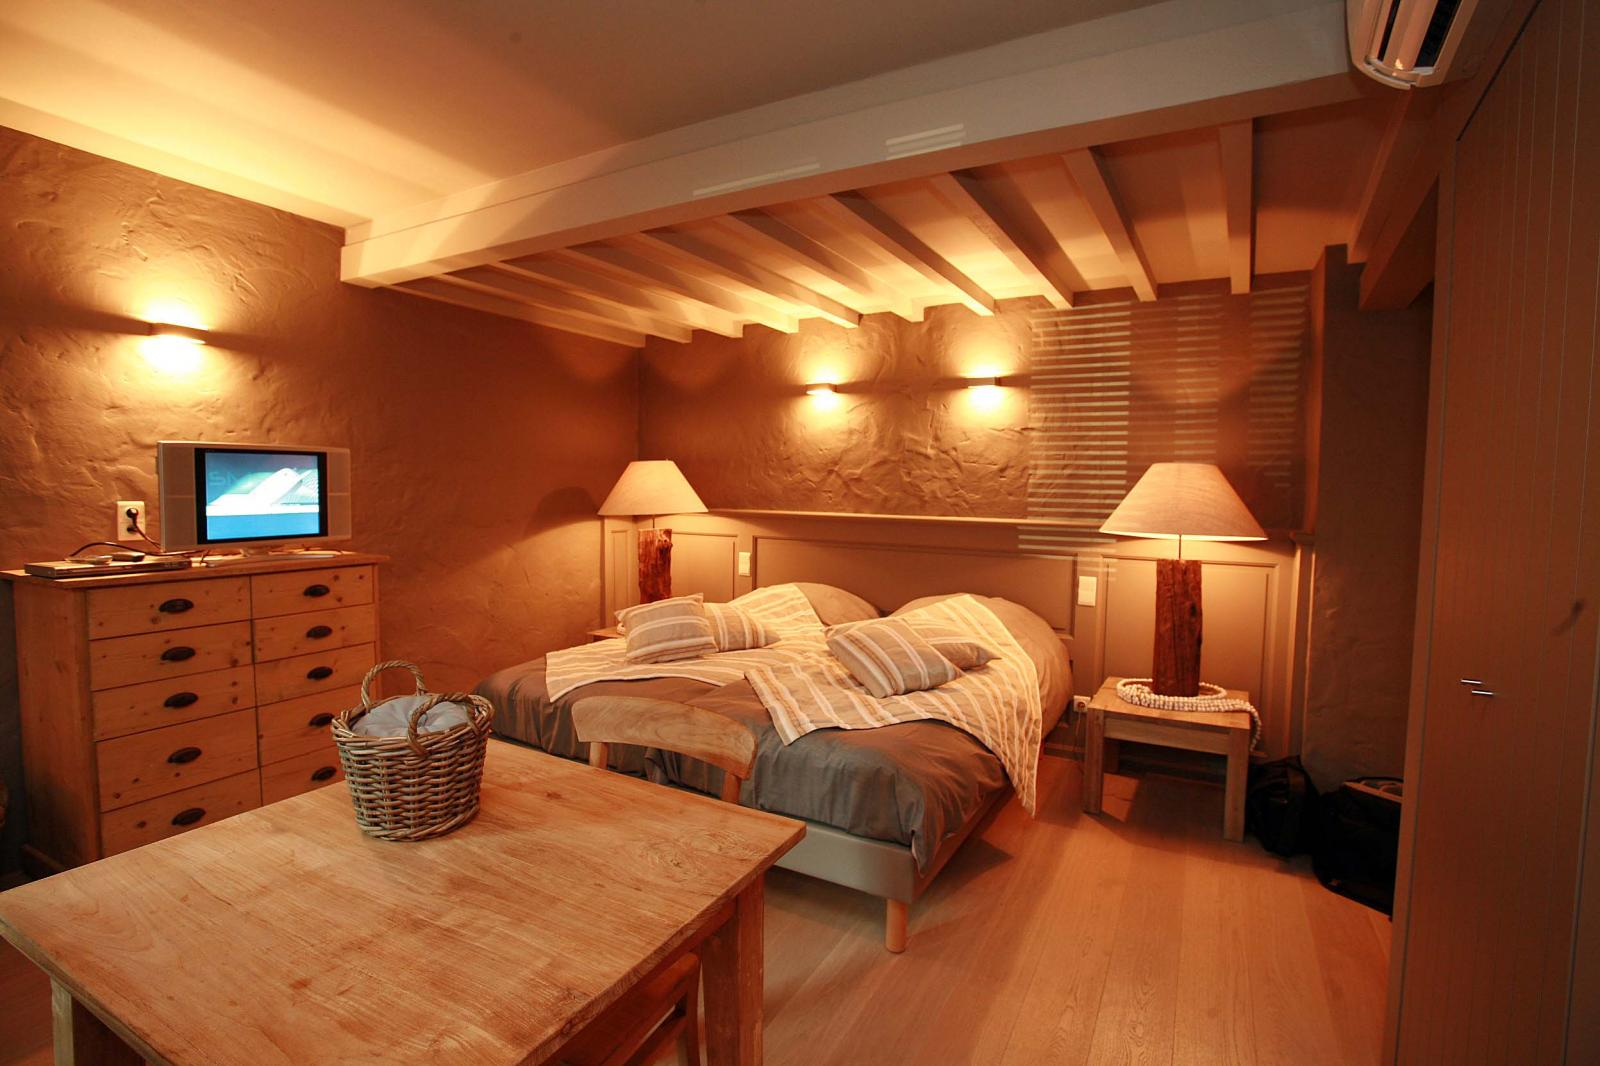 Leuke adresjes van yvette tips voor een leuk hotel for Le jardin knokke